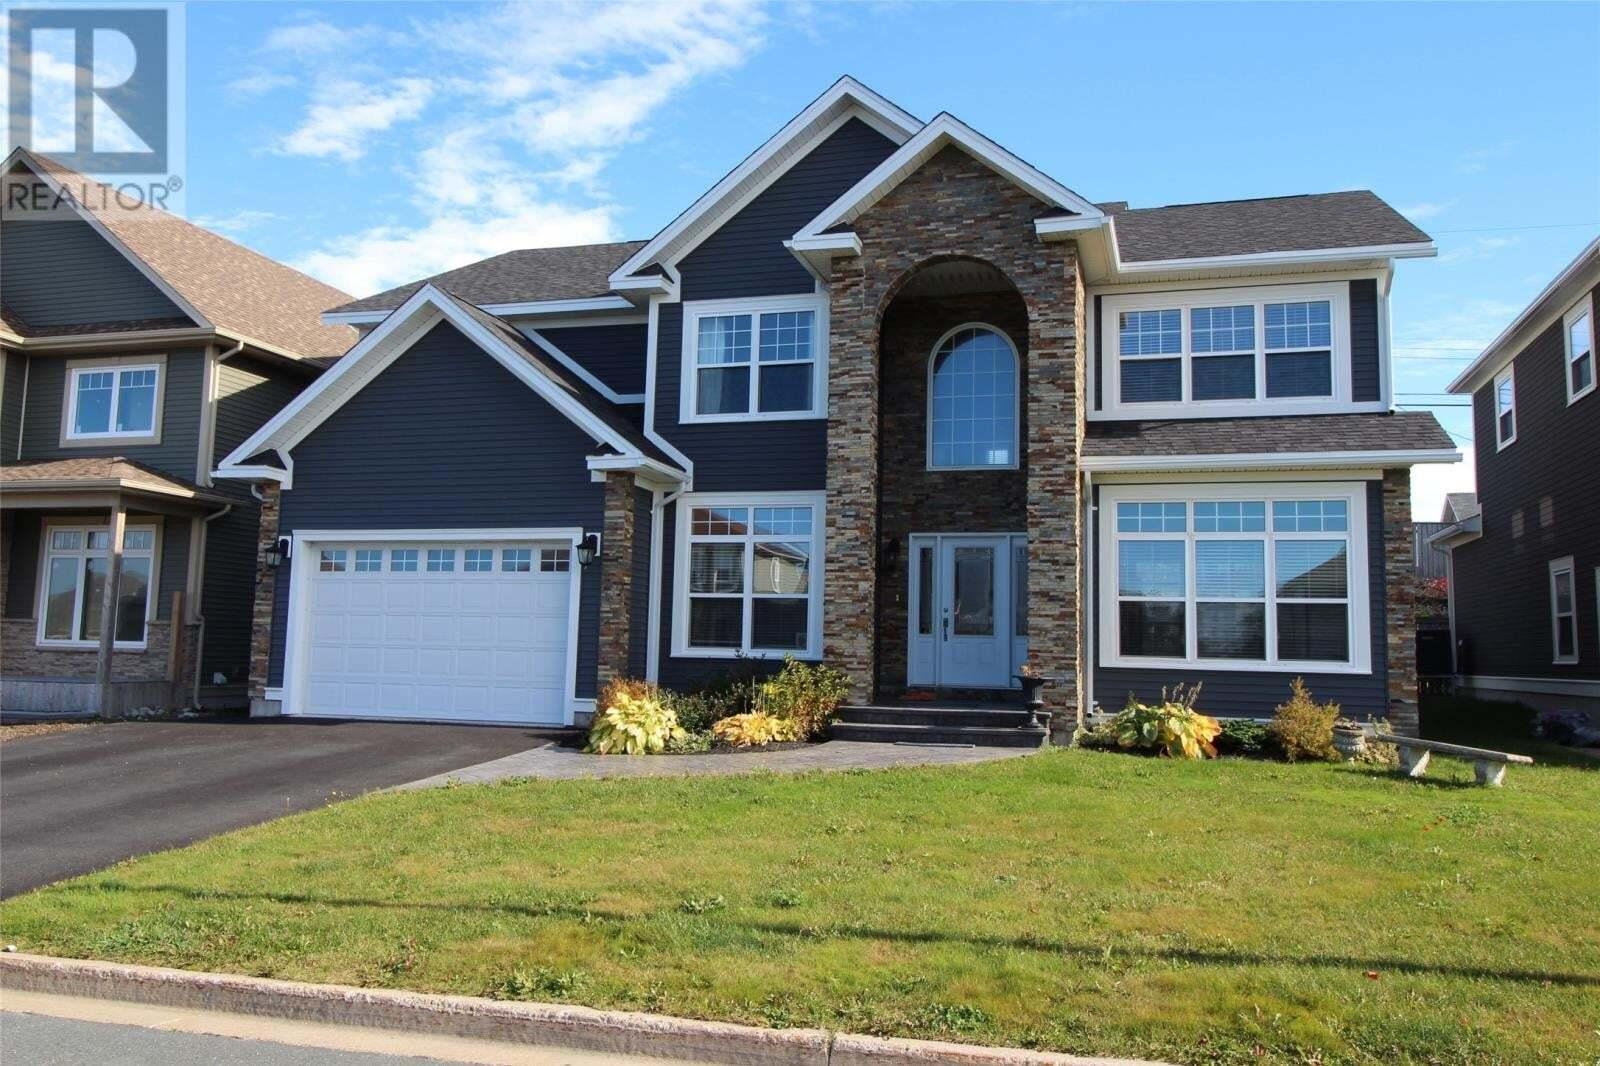 House for sale at 75 Cheyne Dr St. John's Newfoundland - MLS: 1216174